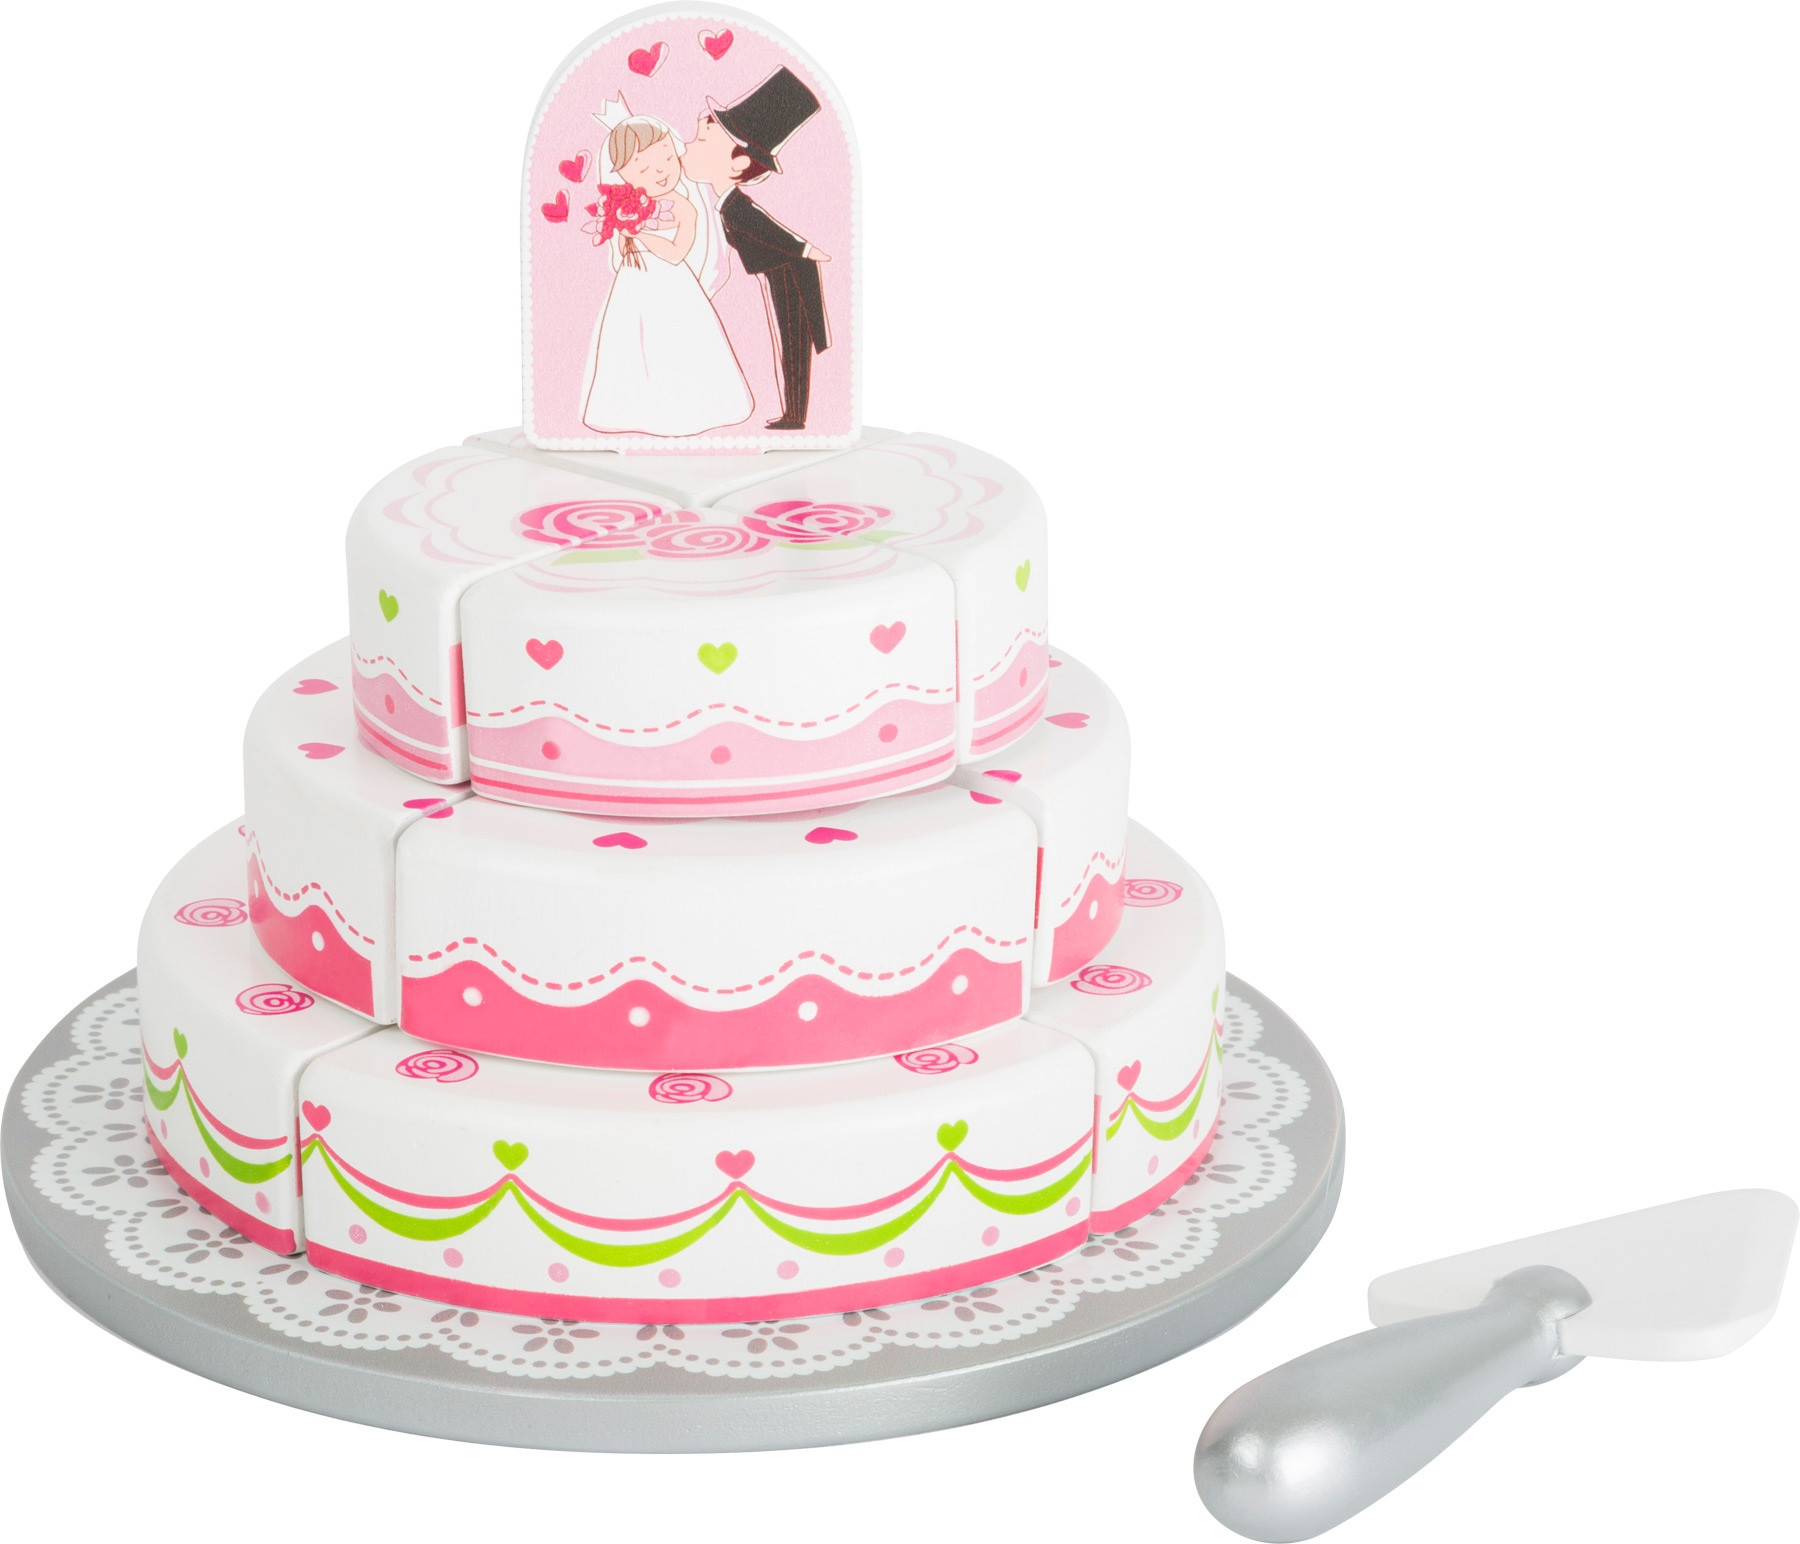 Small Foot Wooden Wedding Cake Whitepink 20 X 16 Cm Internet Toys